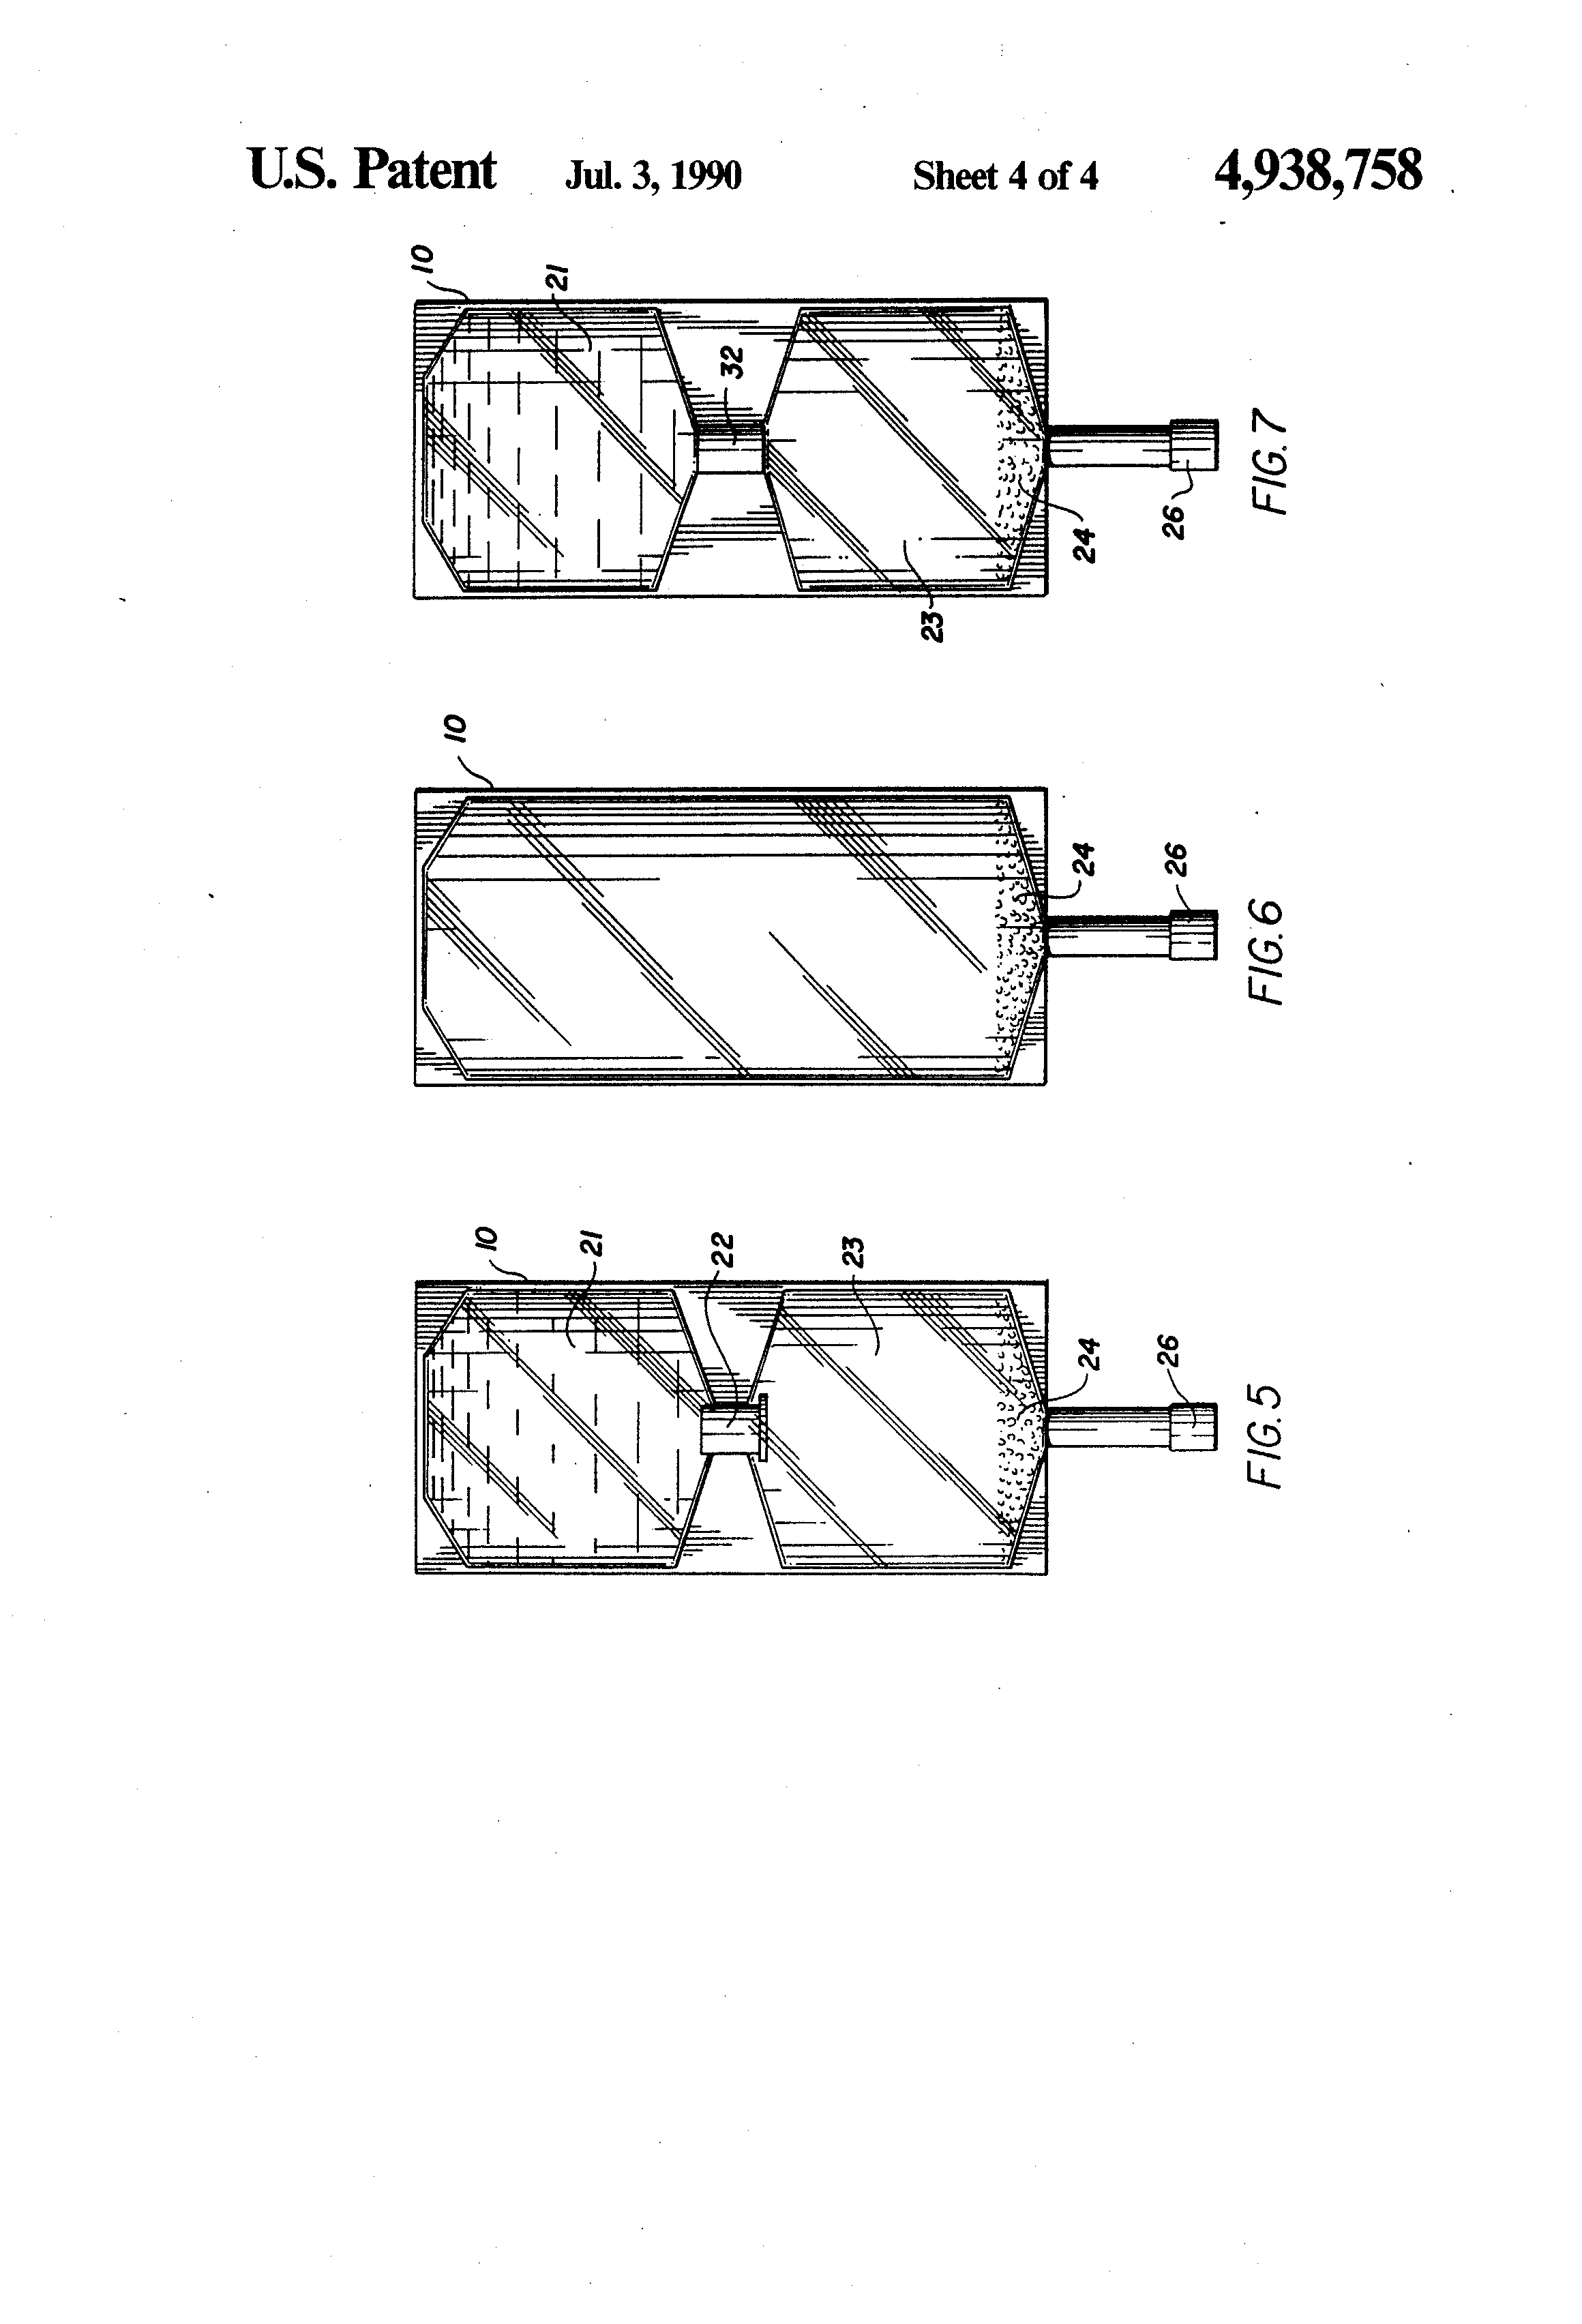 haloperidol decanoate availability